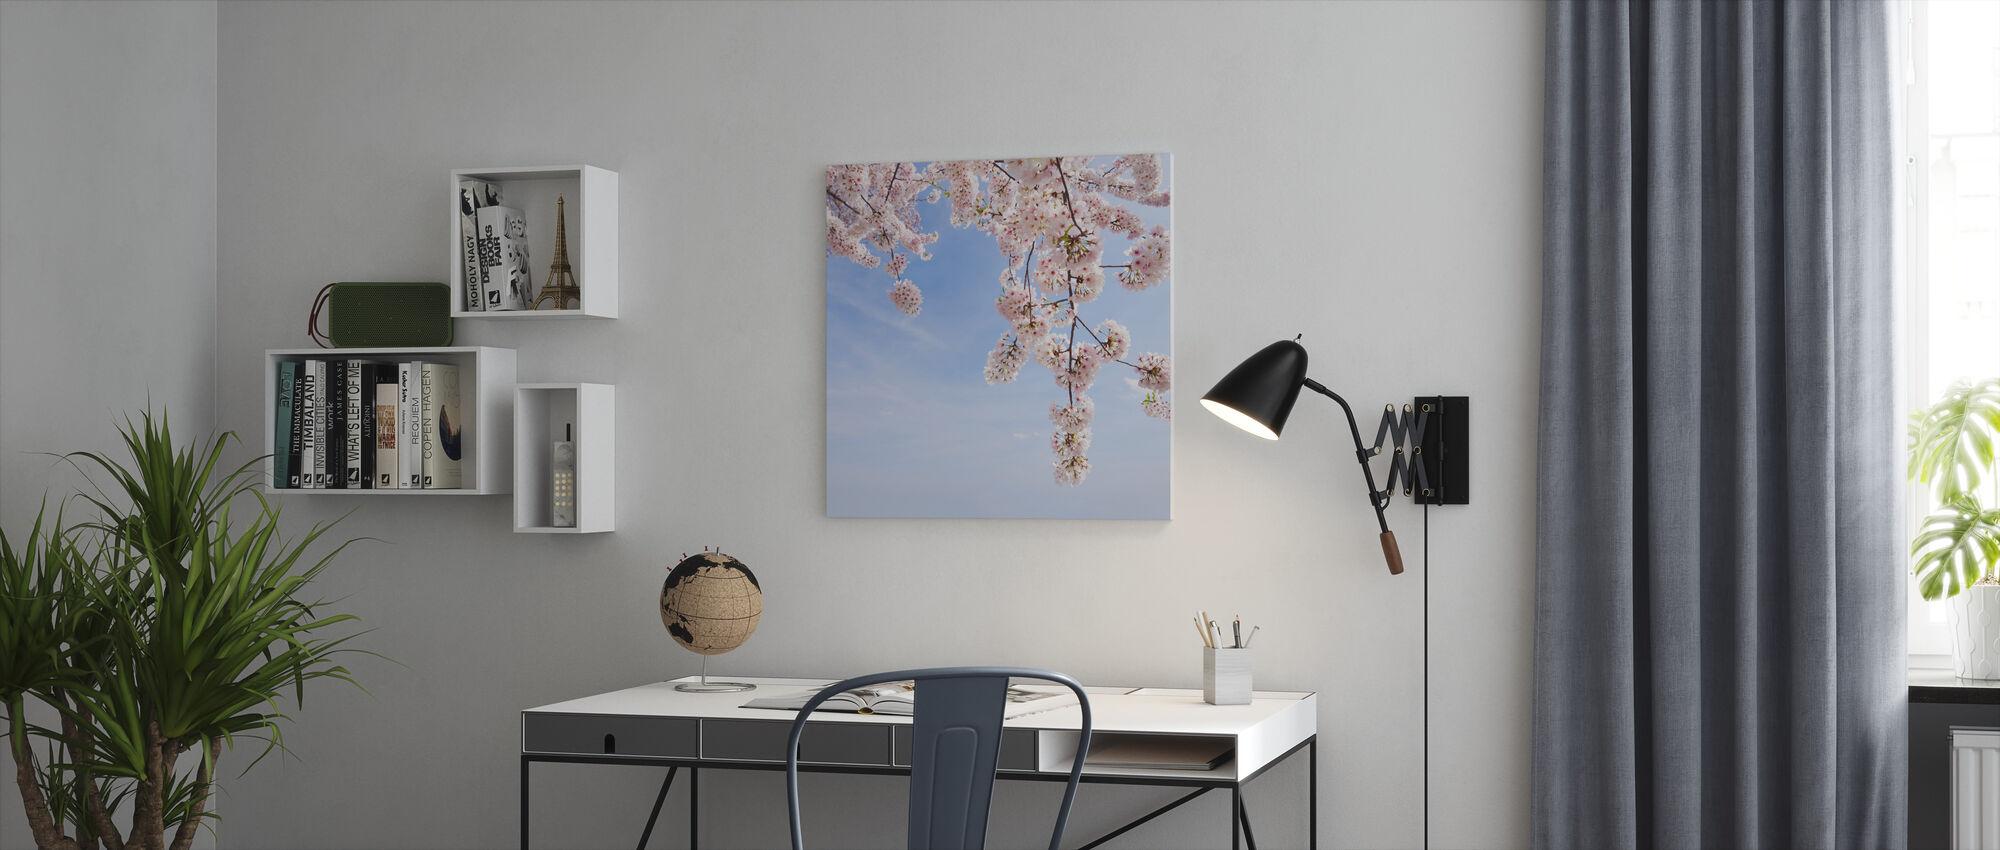 Under a Cherry Tree - Canvas print - Office